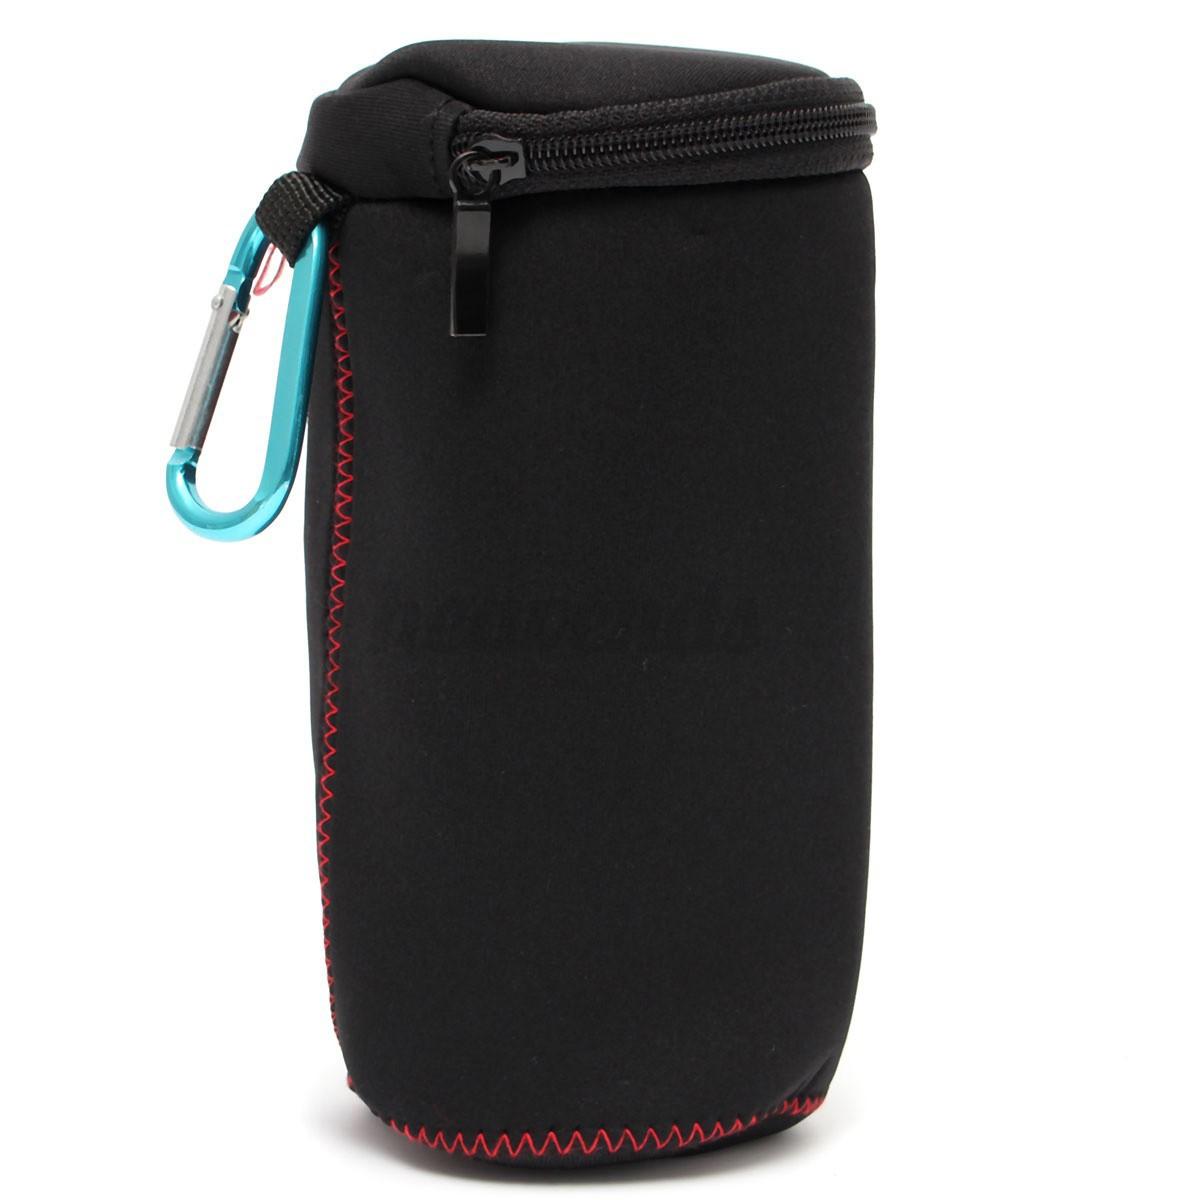 sac etui coque bag pr jbl pulse flip 1 charge 2 bluetooth enceintes haut parleur ebay. Black Bedroom Furniture Sets. Home Design Ideas